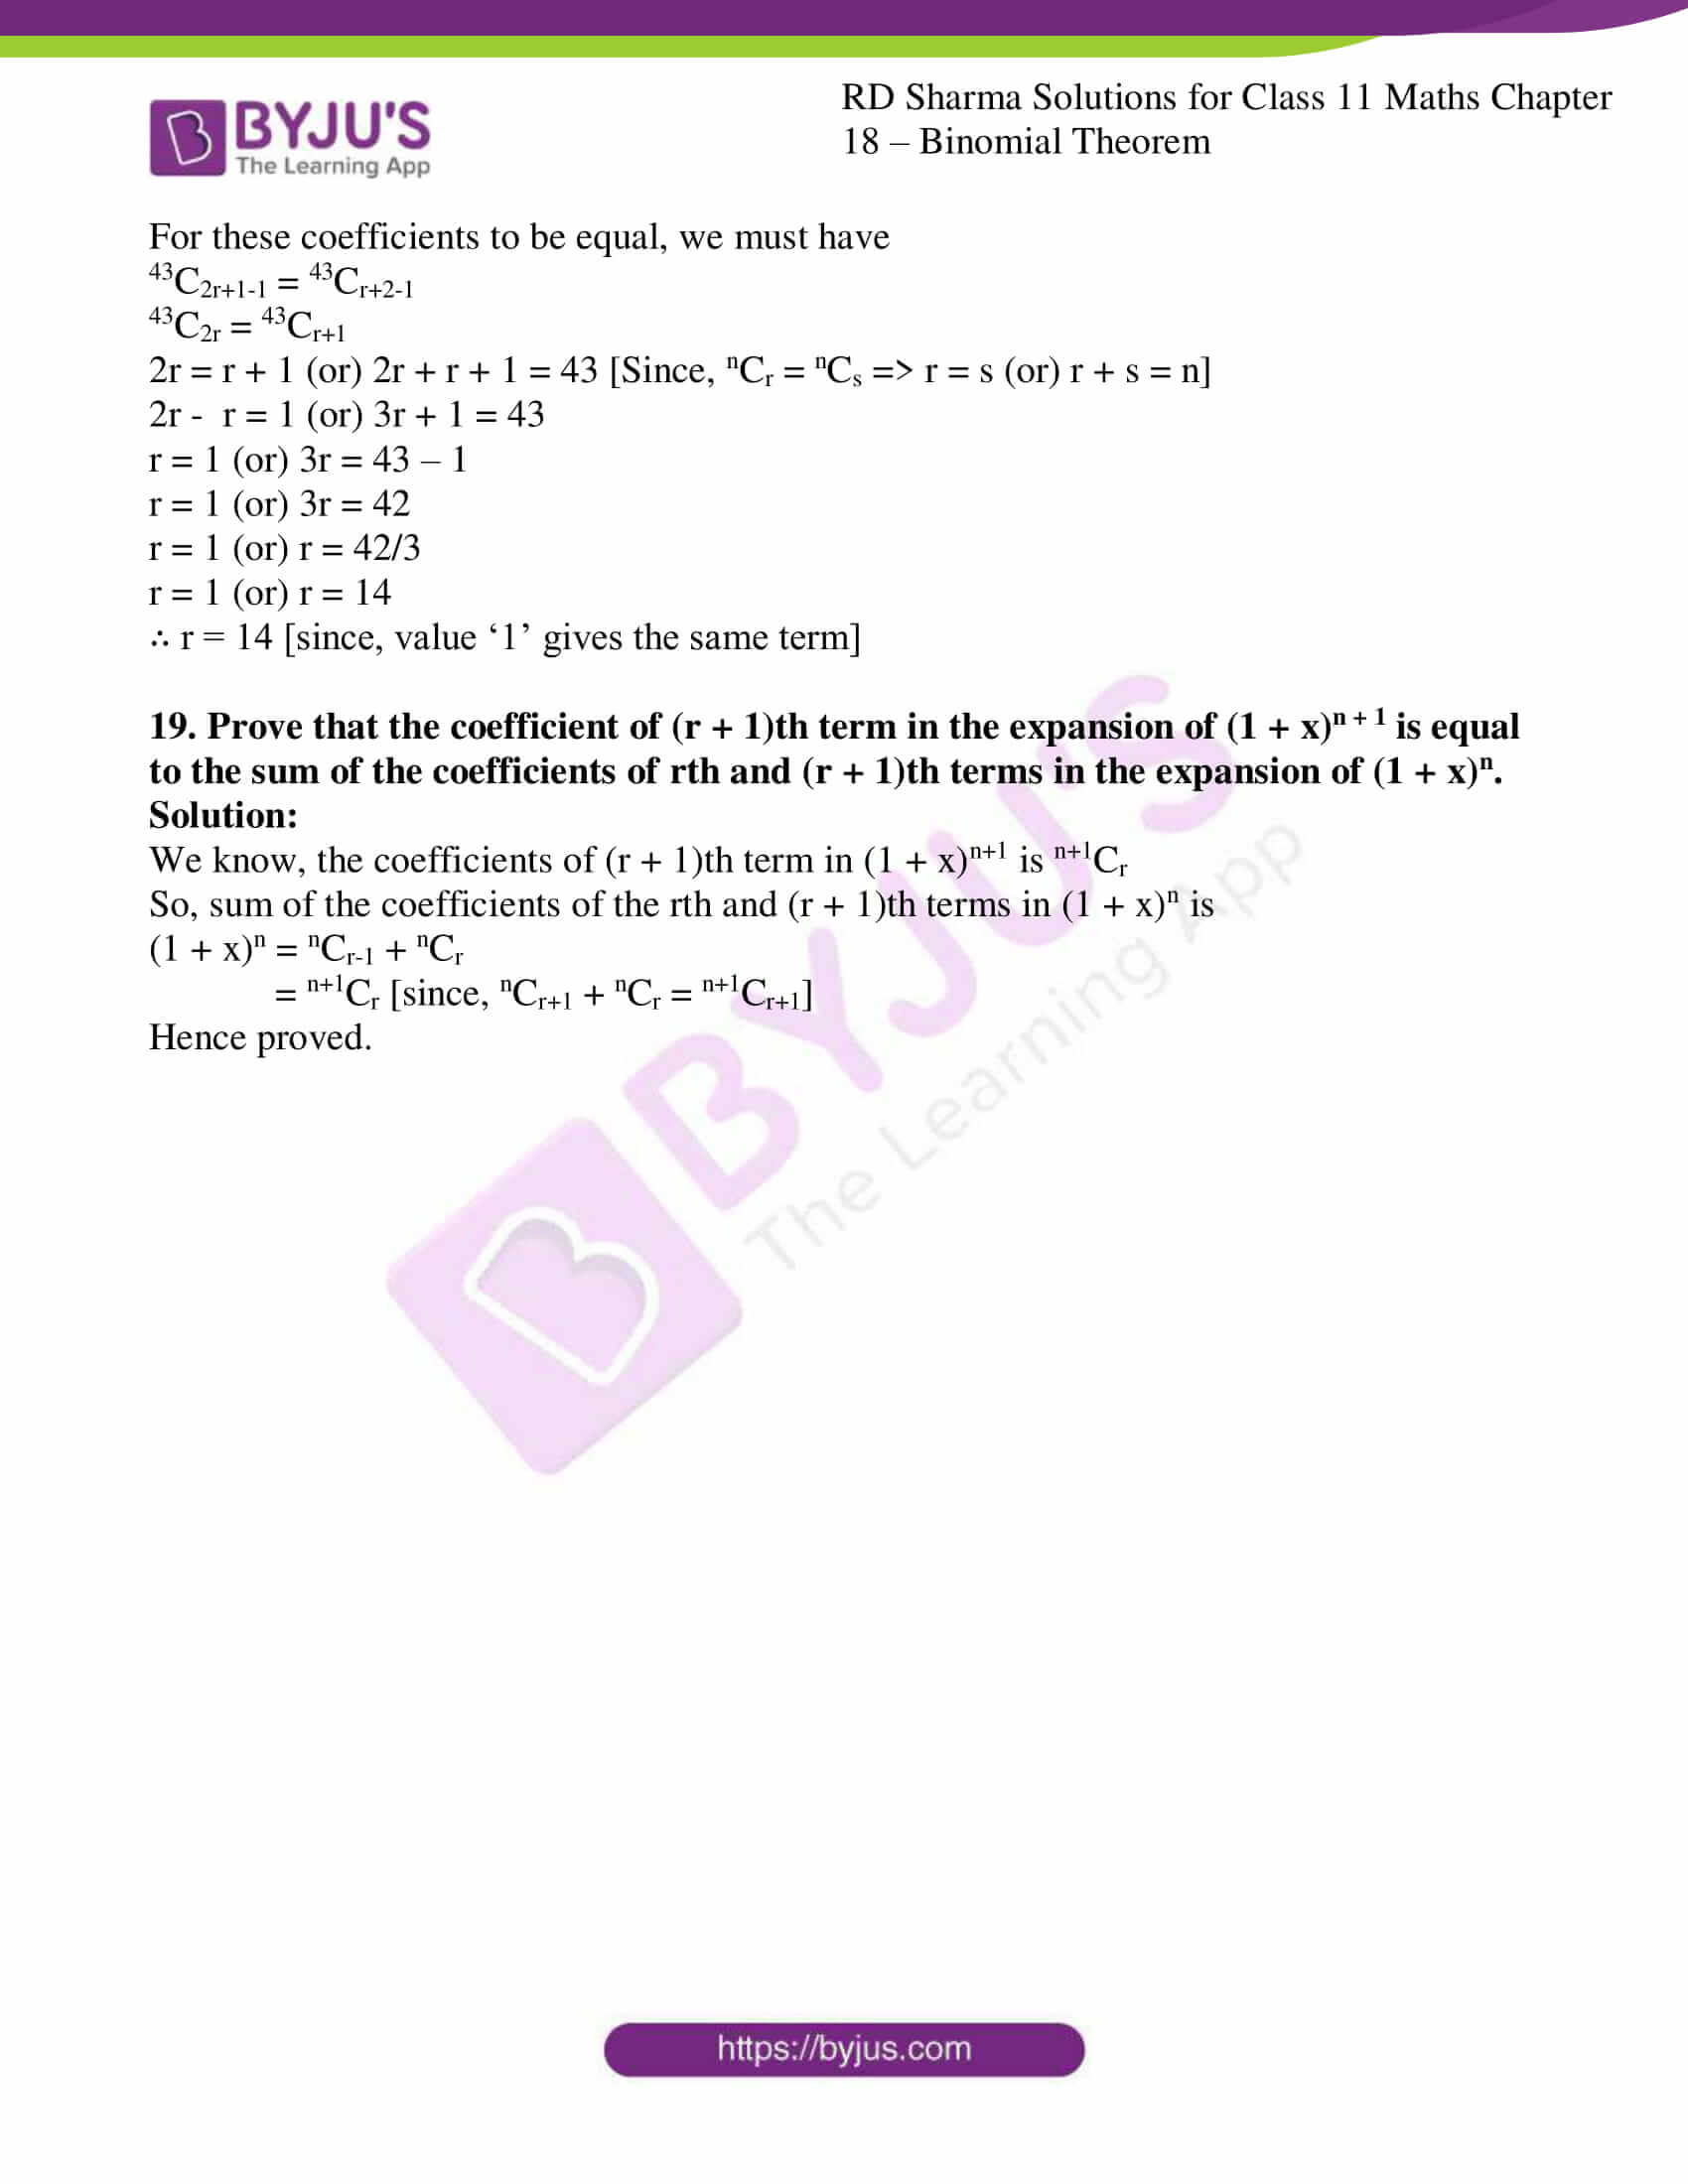 rd sharma class 11 maths ch 18 ex 2 24